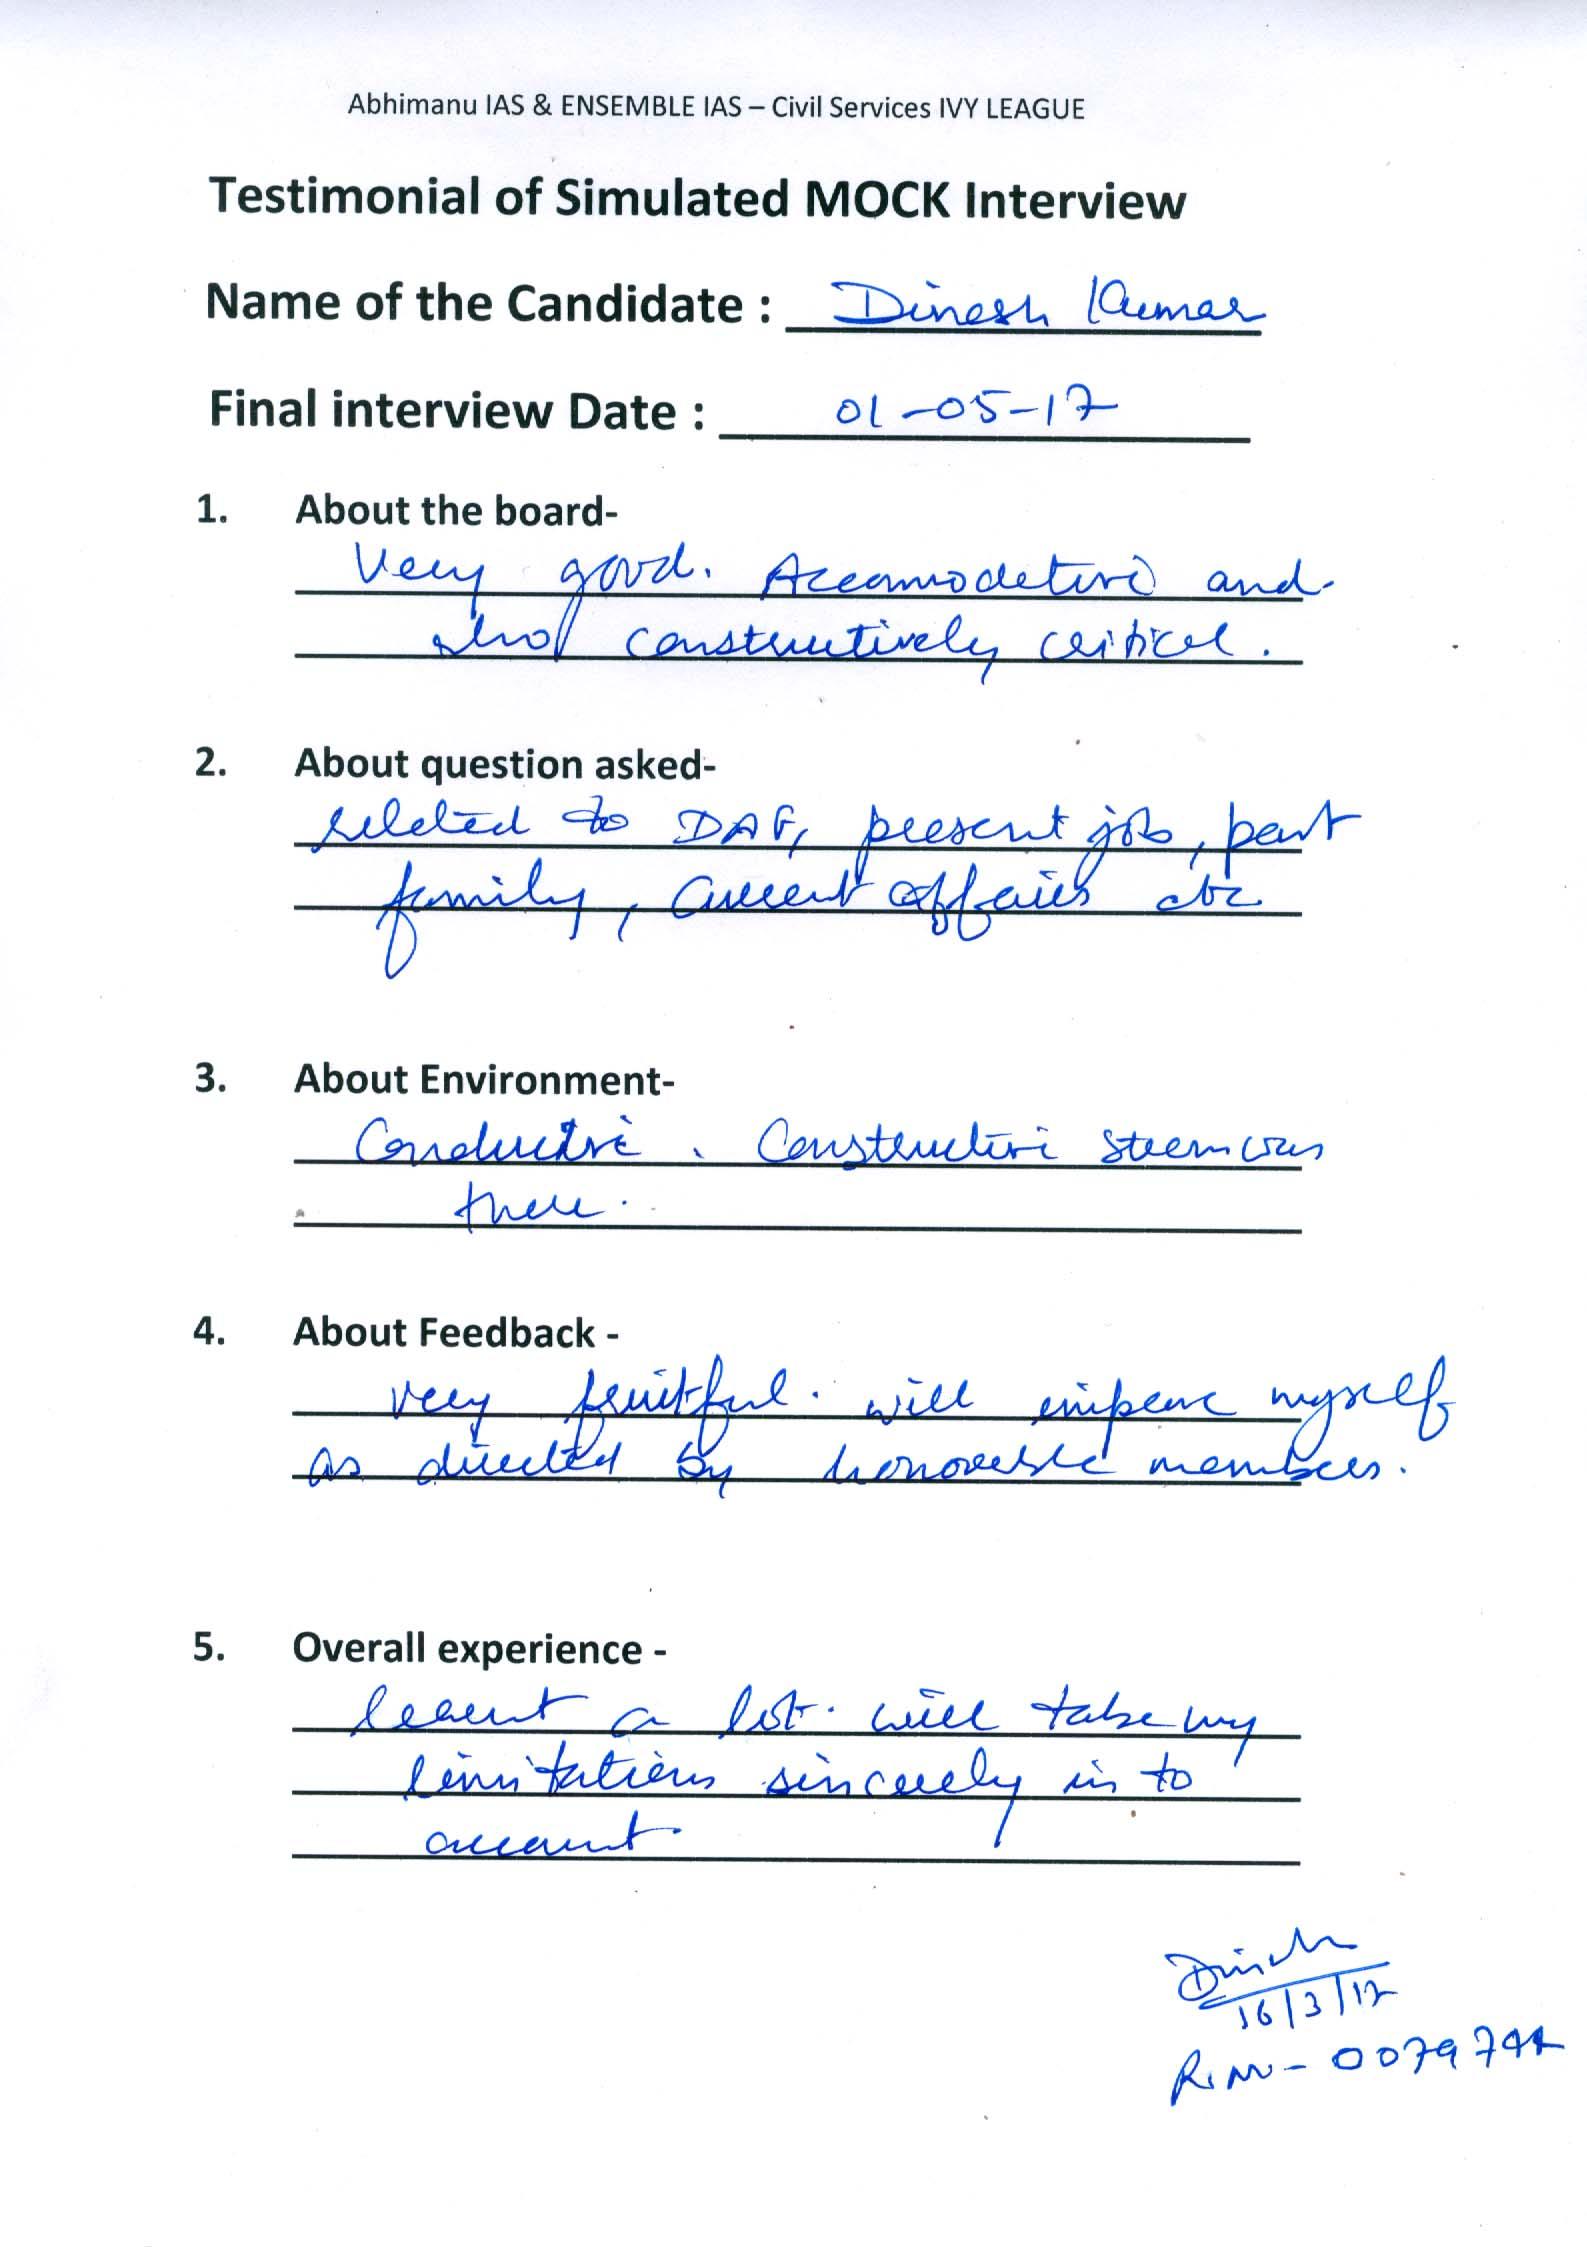 Interview Testimonial By- Dinesh Kumar